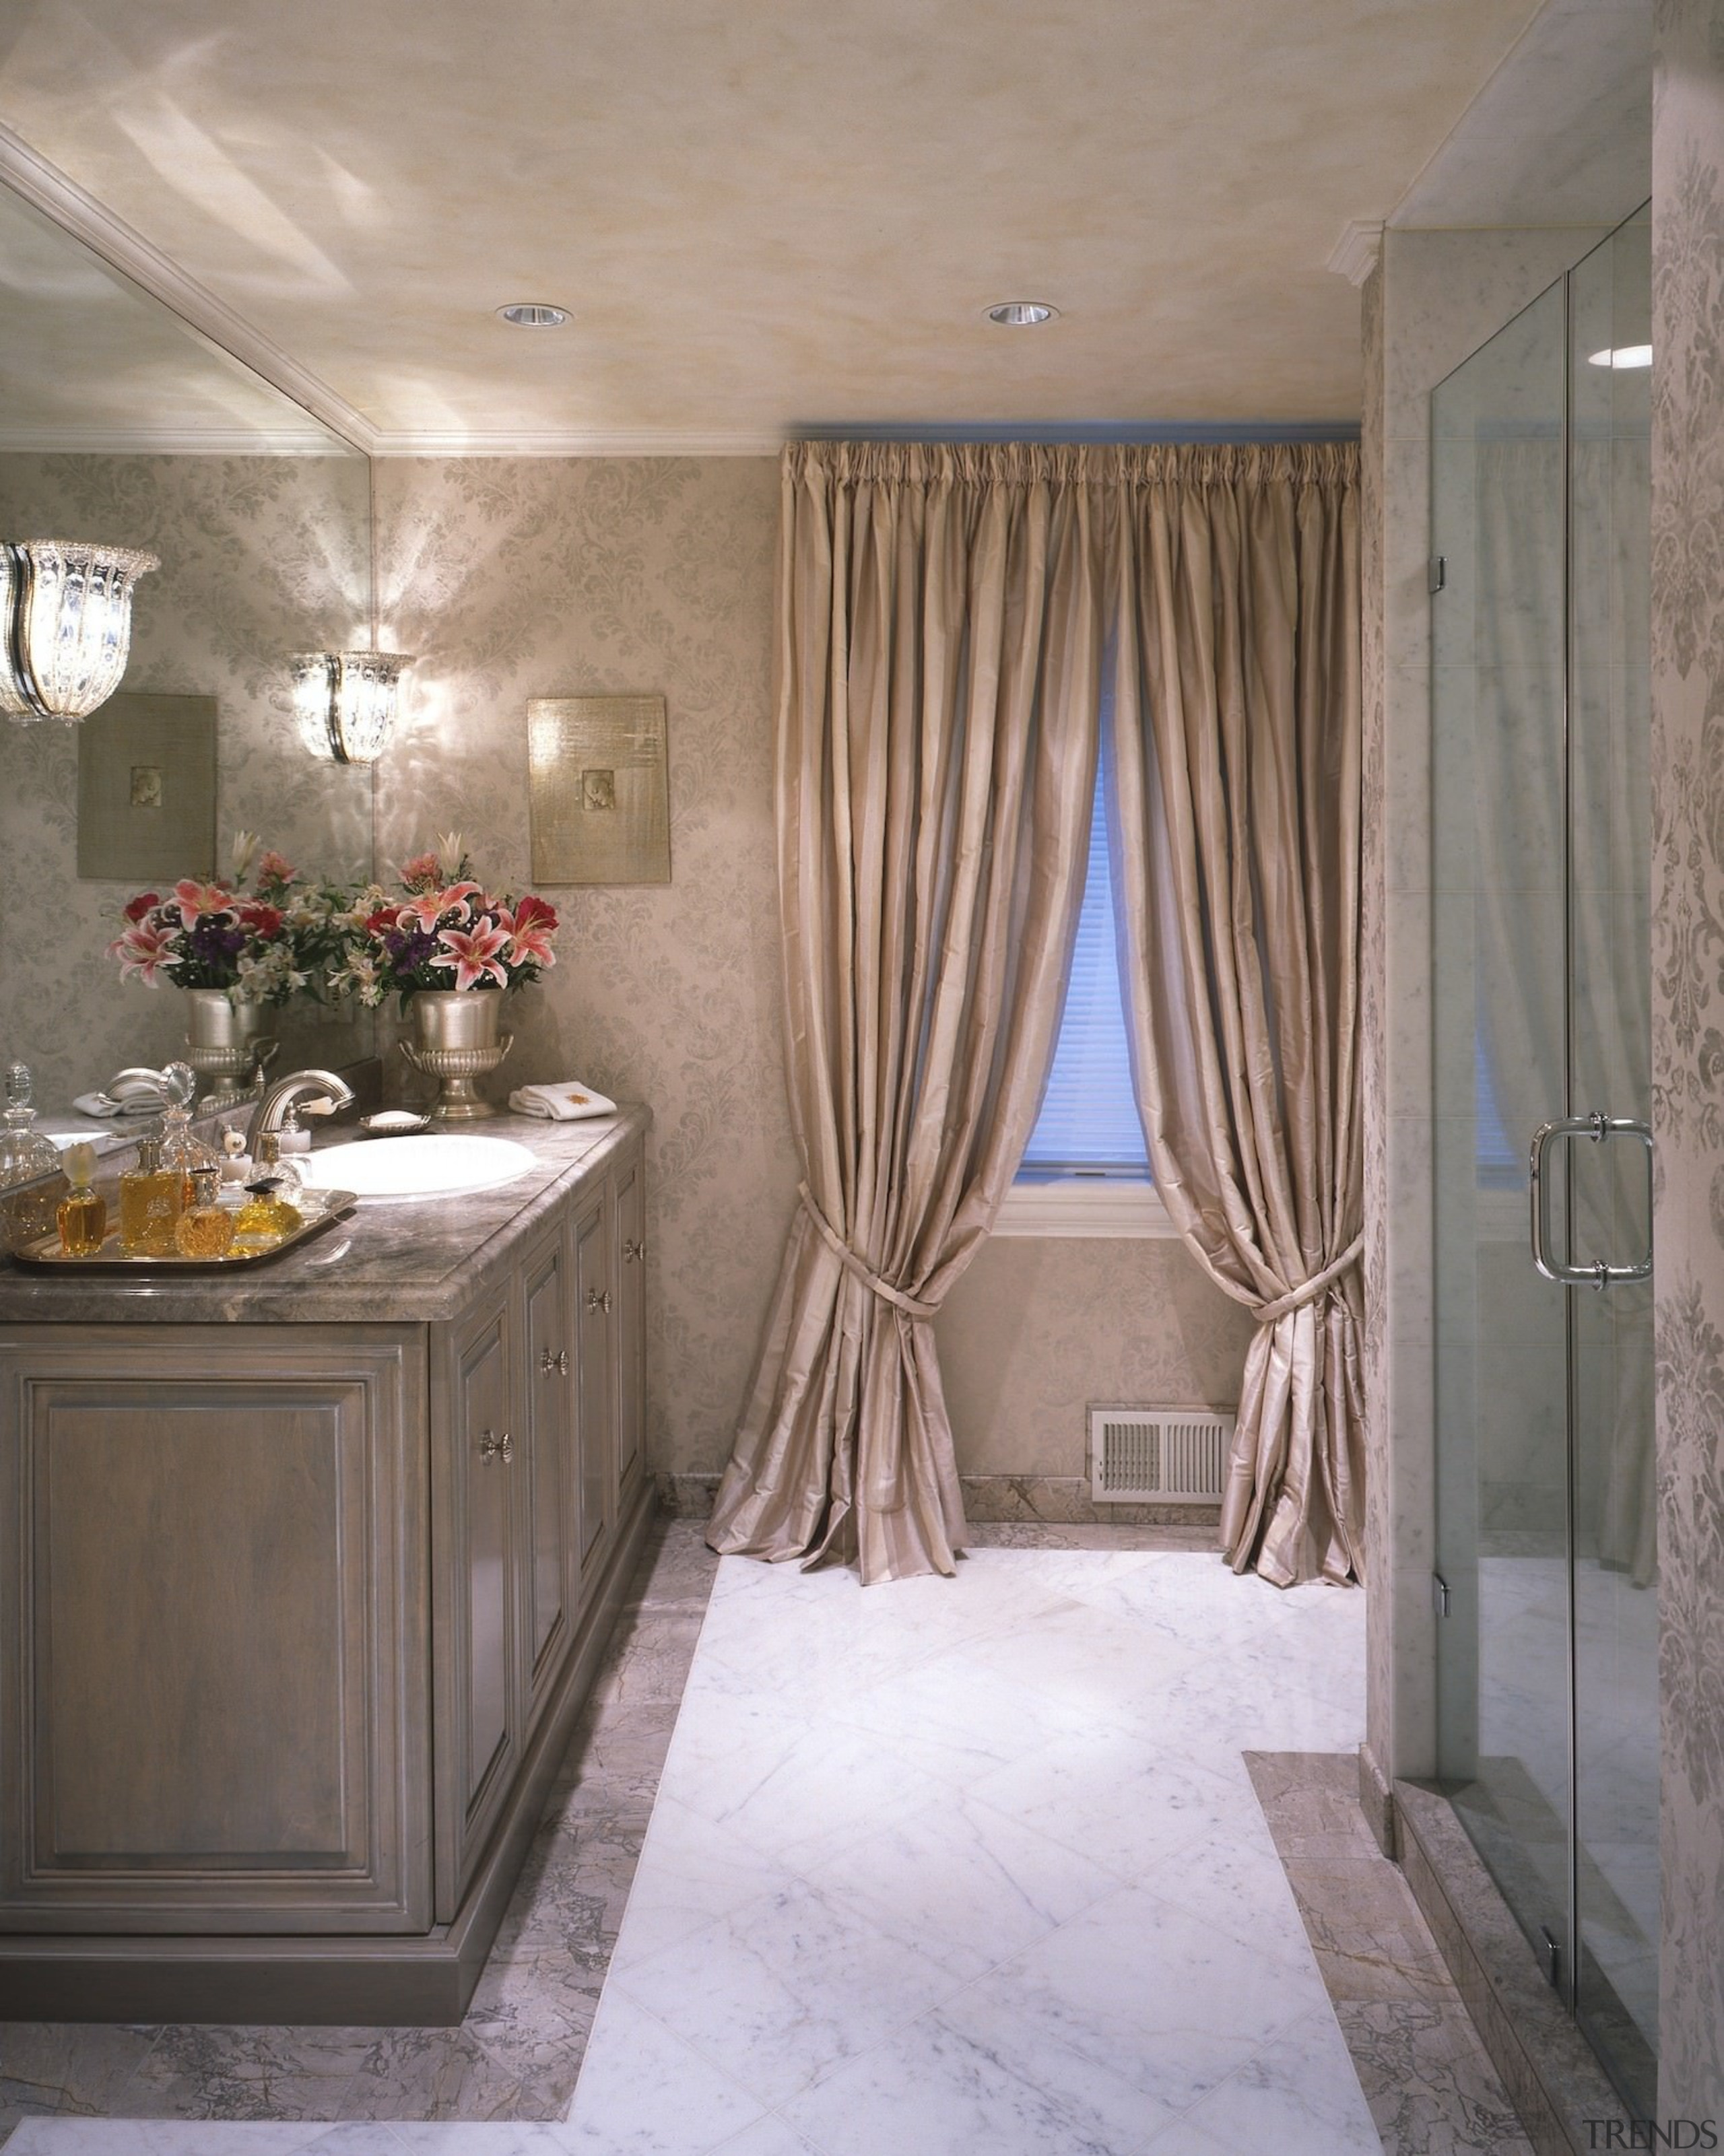 Elegant fittings line this bathroom - Elegant fittings bathroom, ceiling, curtain, floor, flooring, home, interior design, room, textile, wall, window, window covering, window treatment, gray